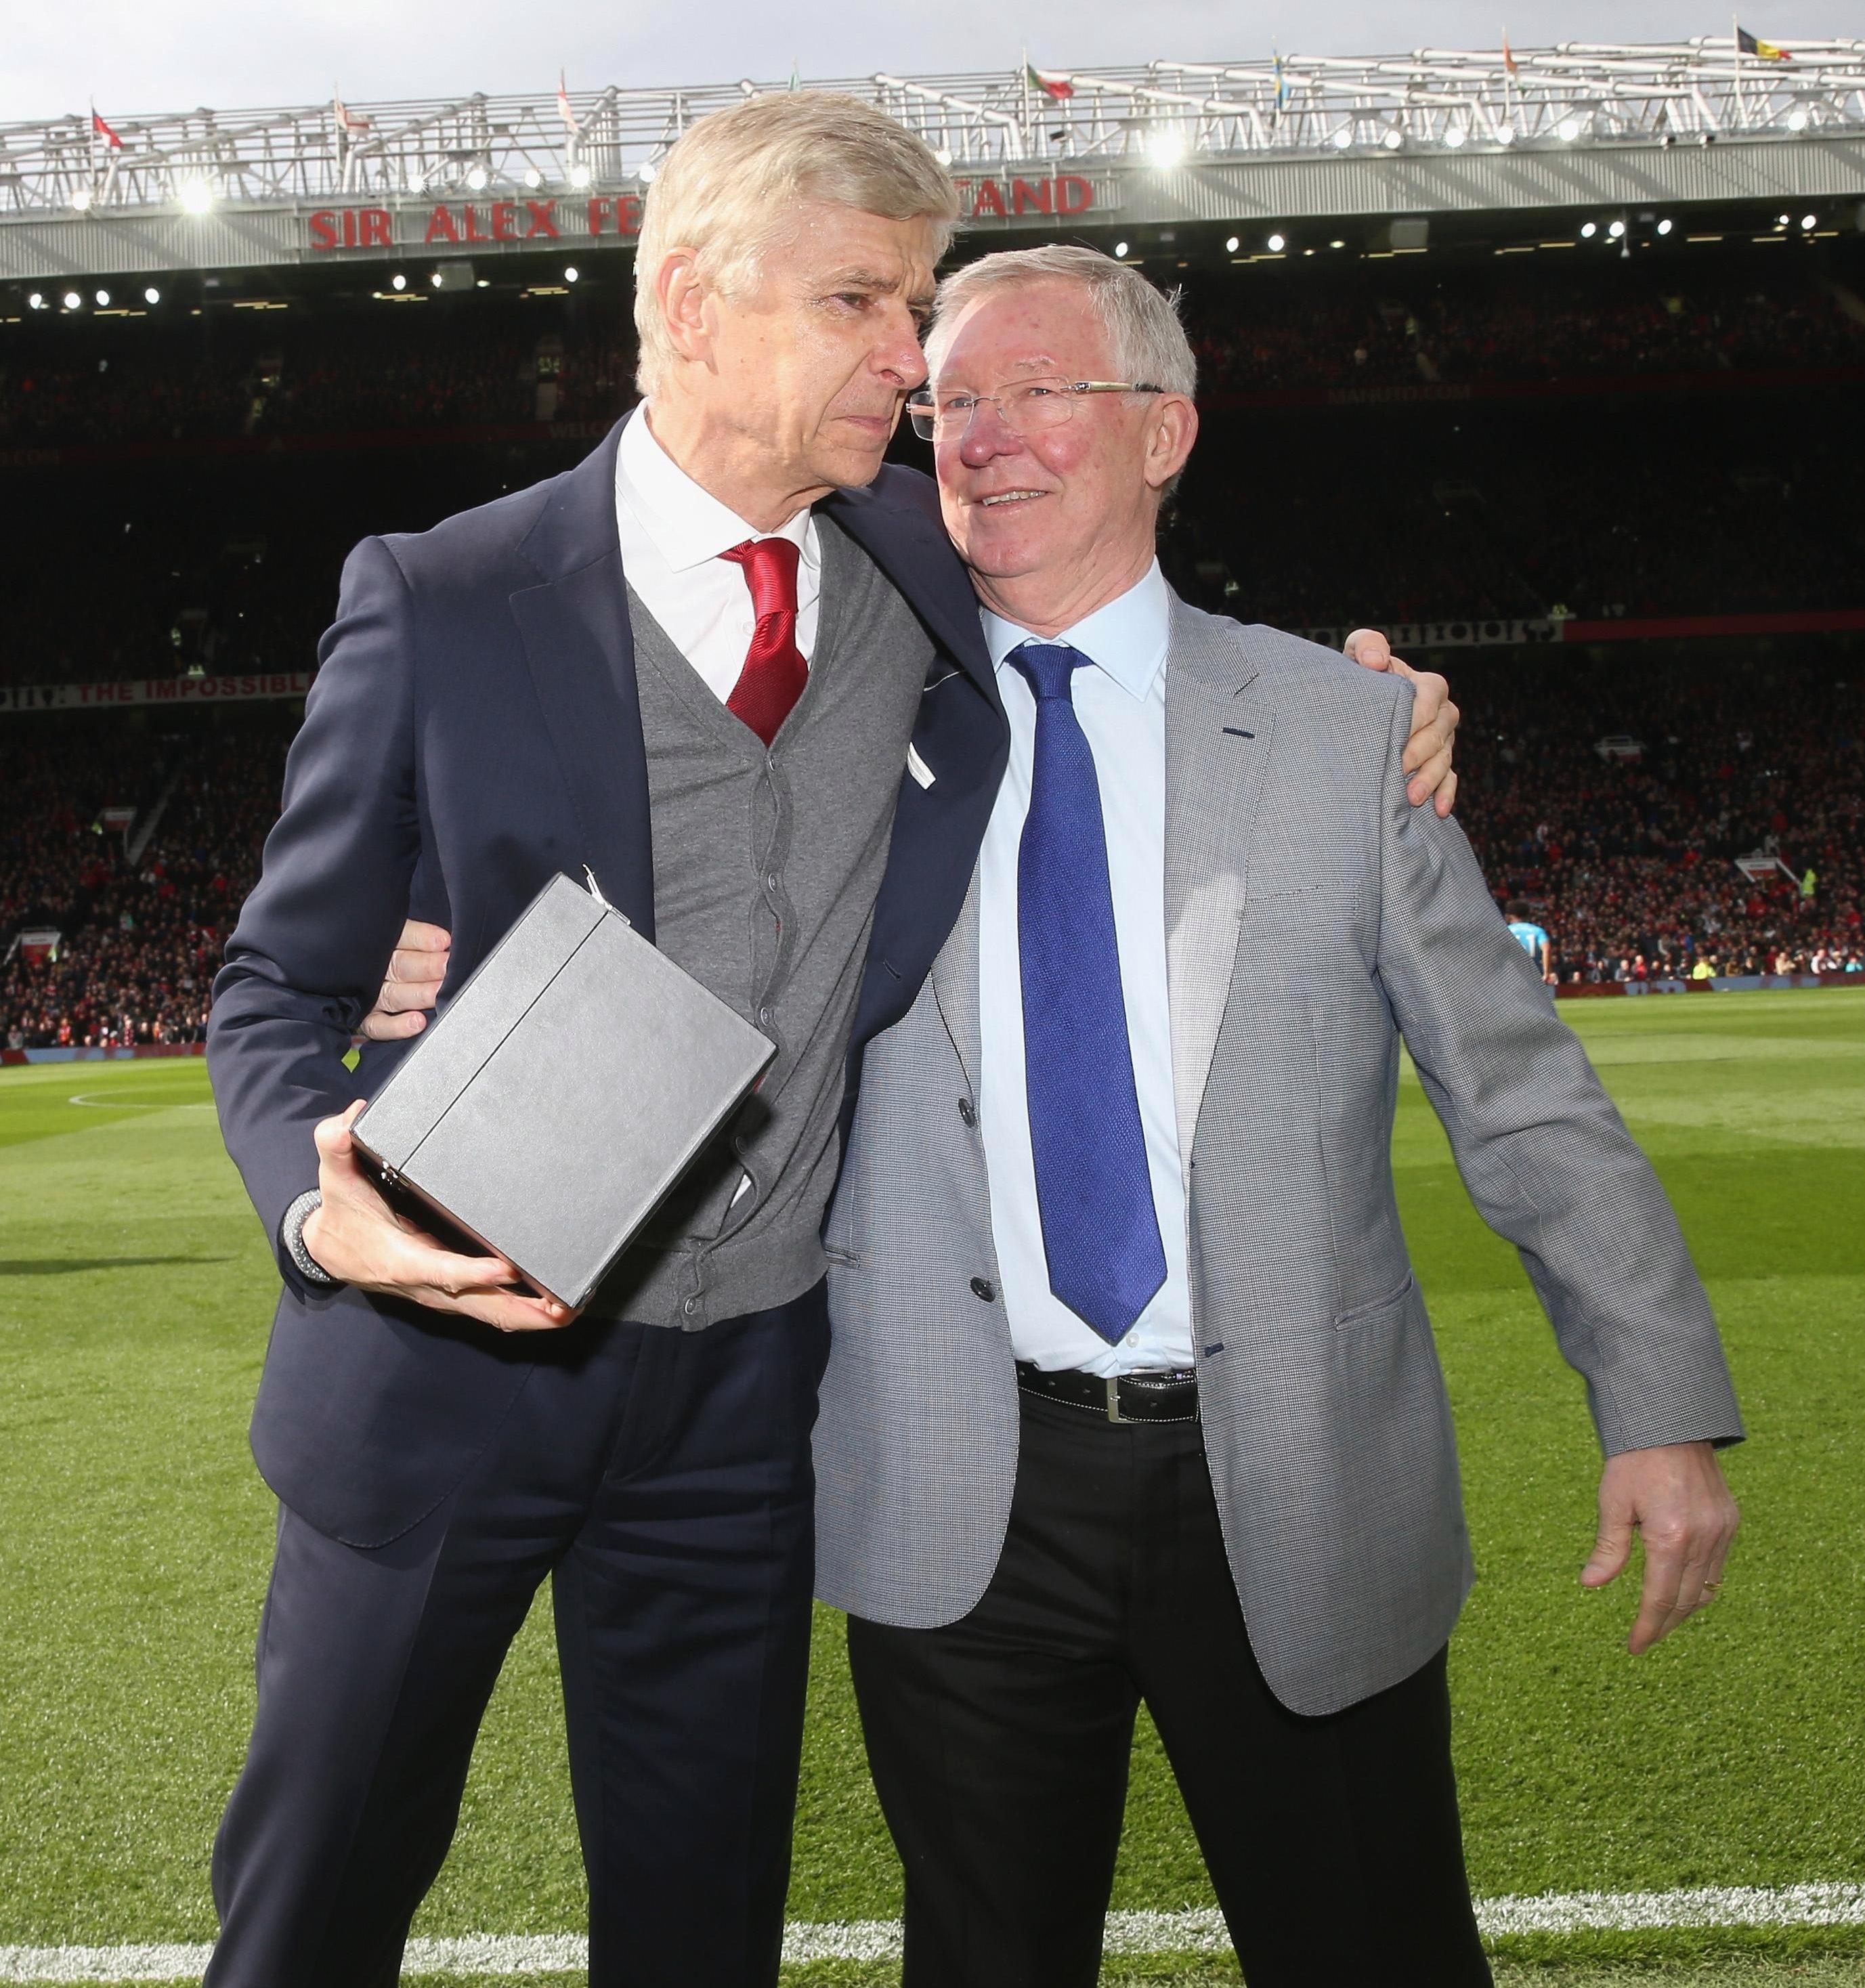 Sir Alex Ferguson handed Arsene Wenger a gift ahead of the game